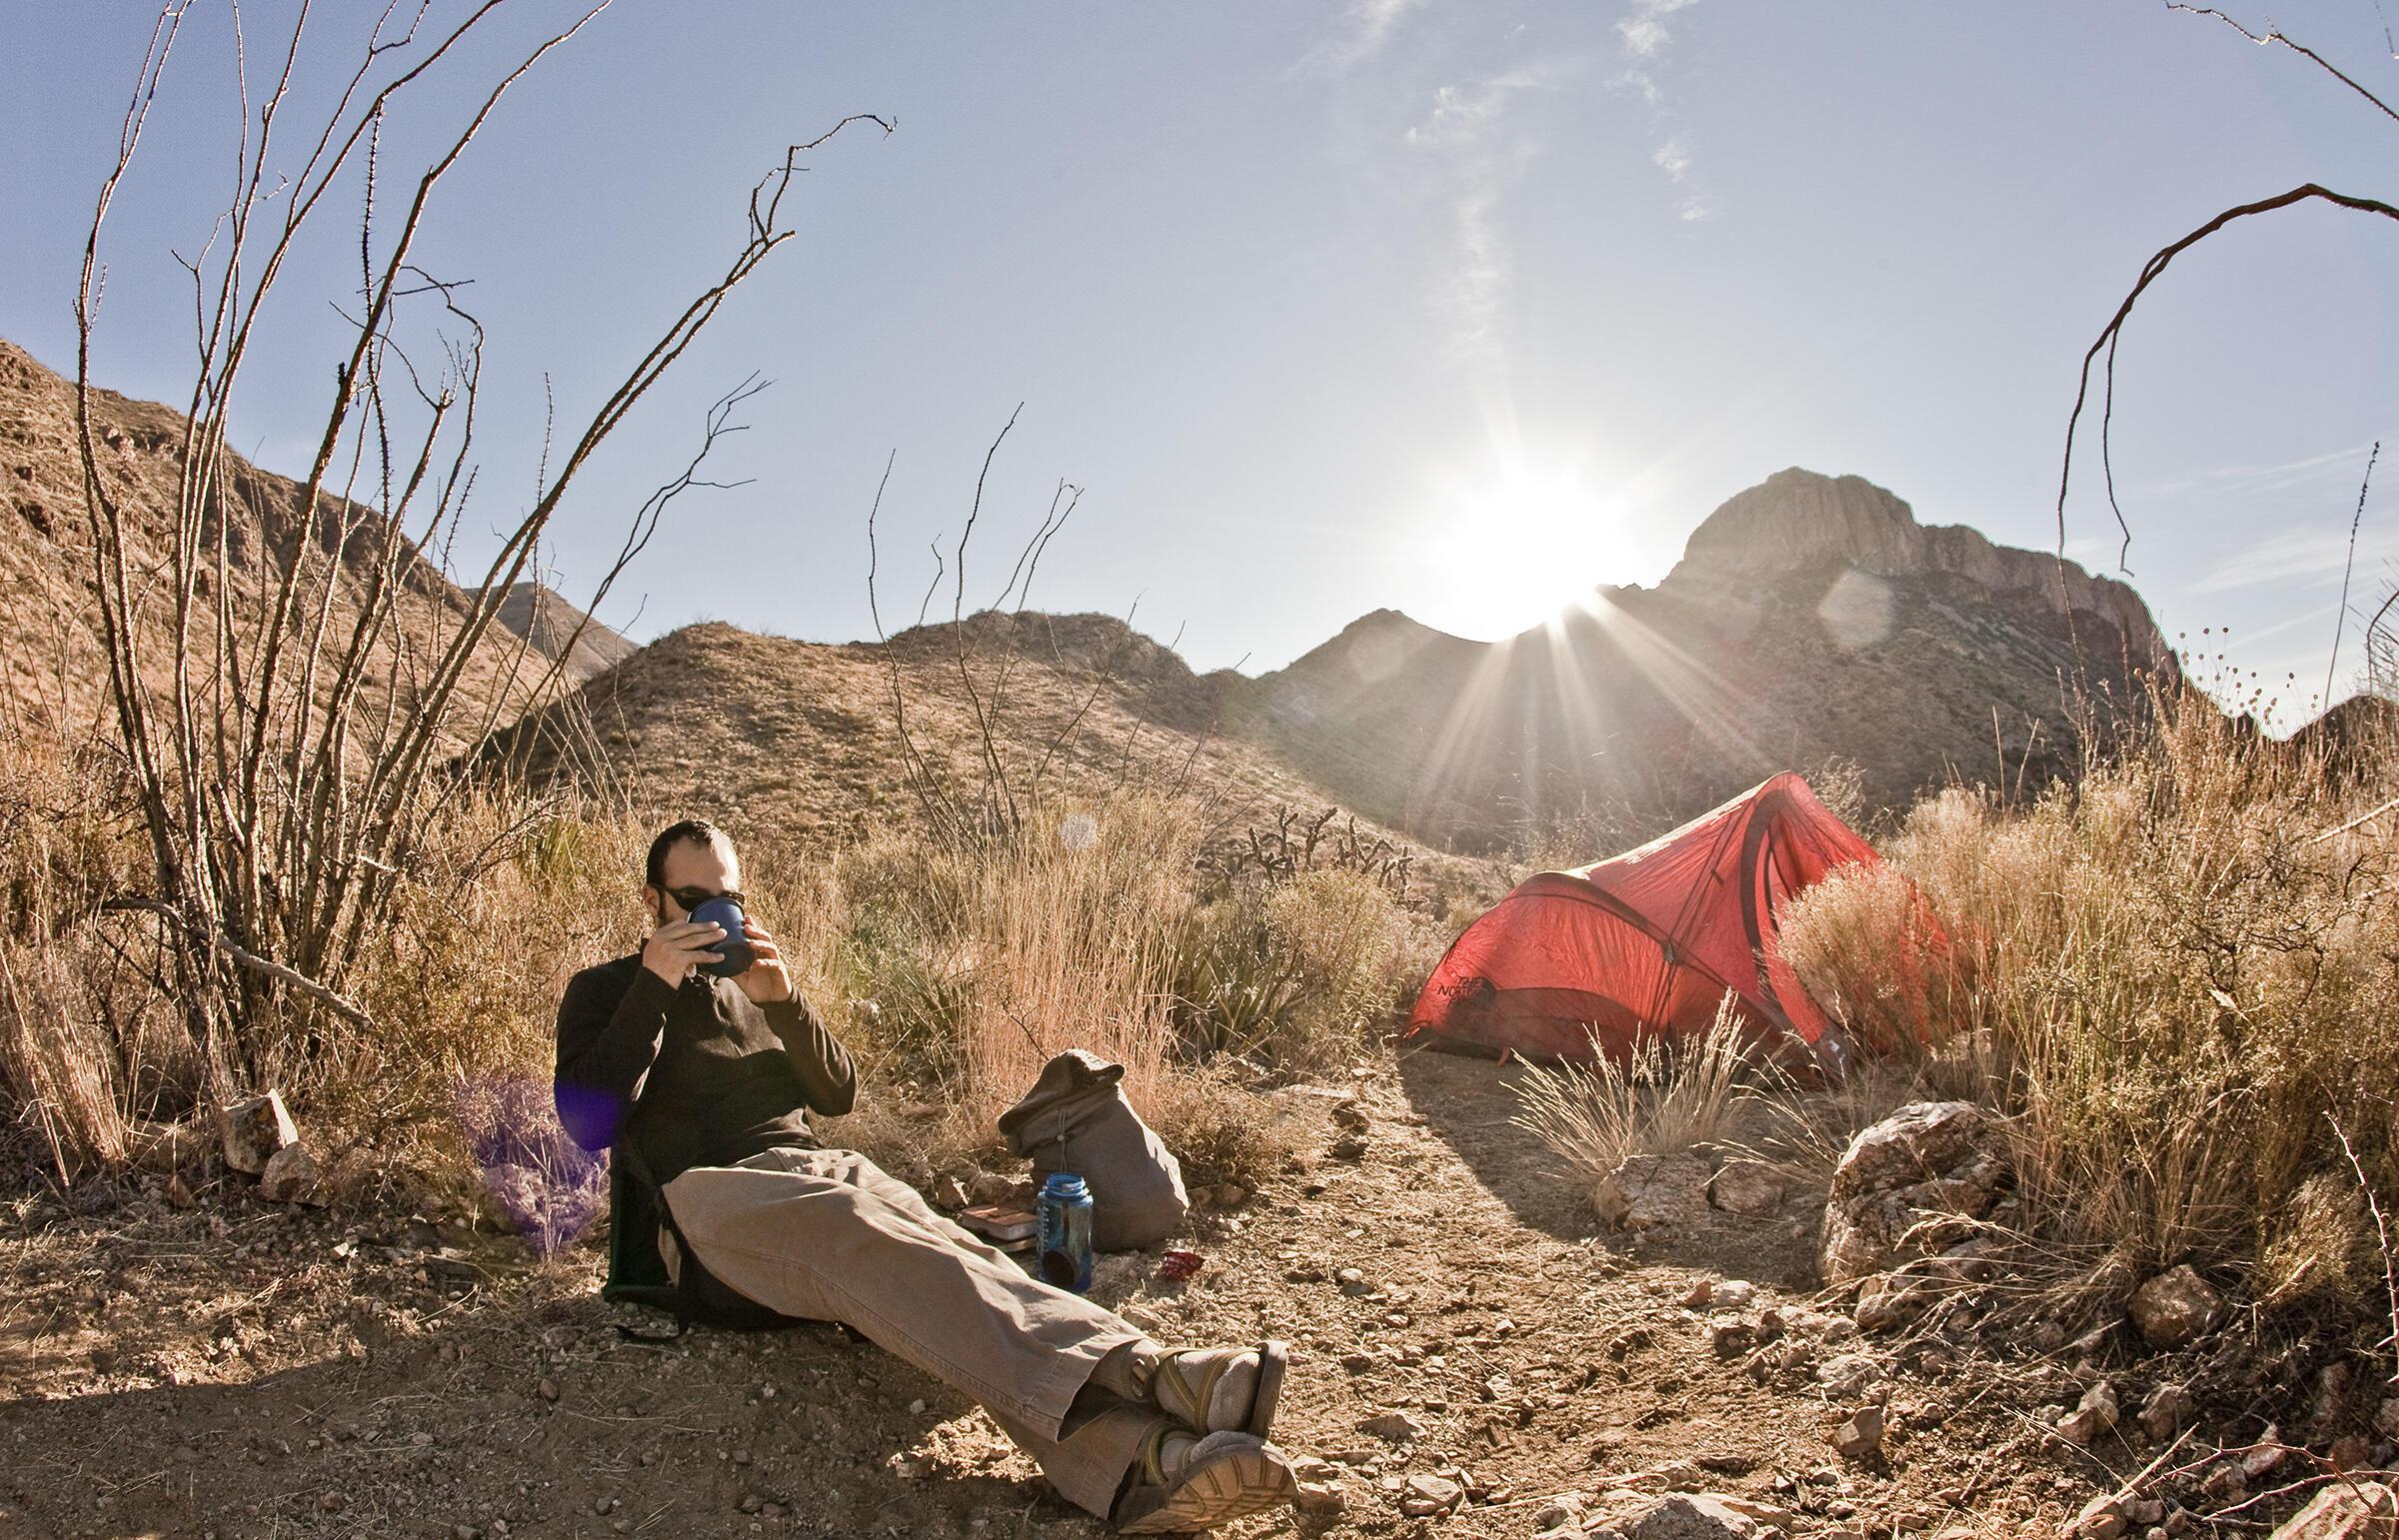 Dodson Trail, Big Bend National Park, Texas. Andrew R. Slaton/Tandemstock.com